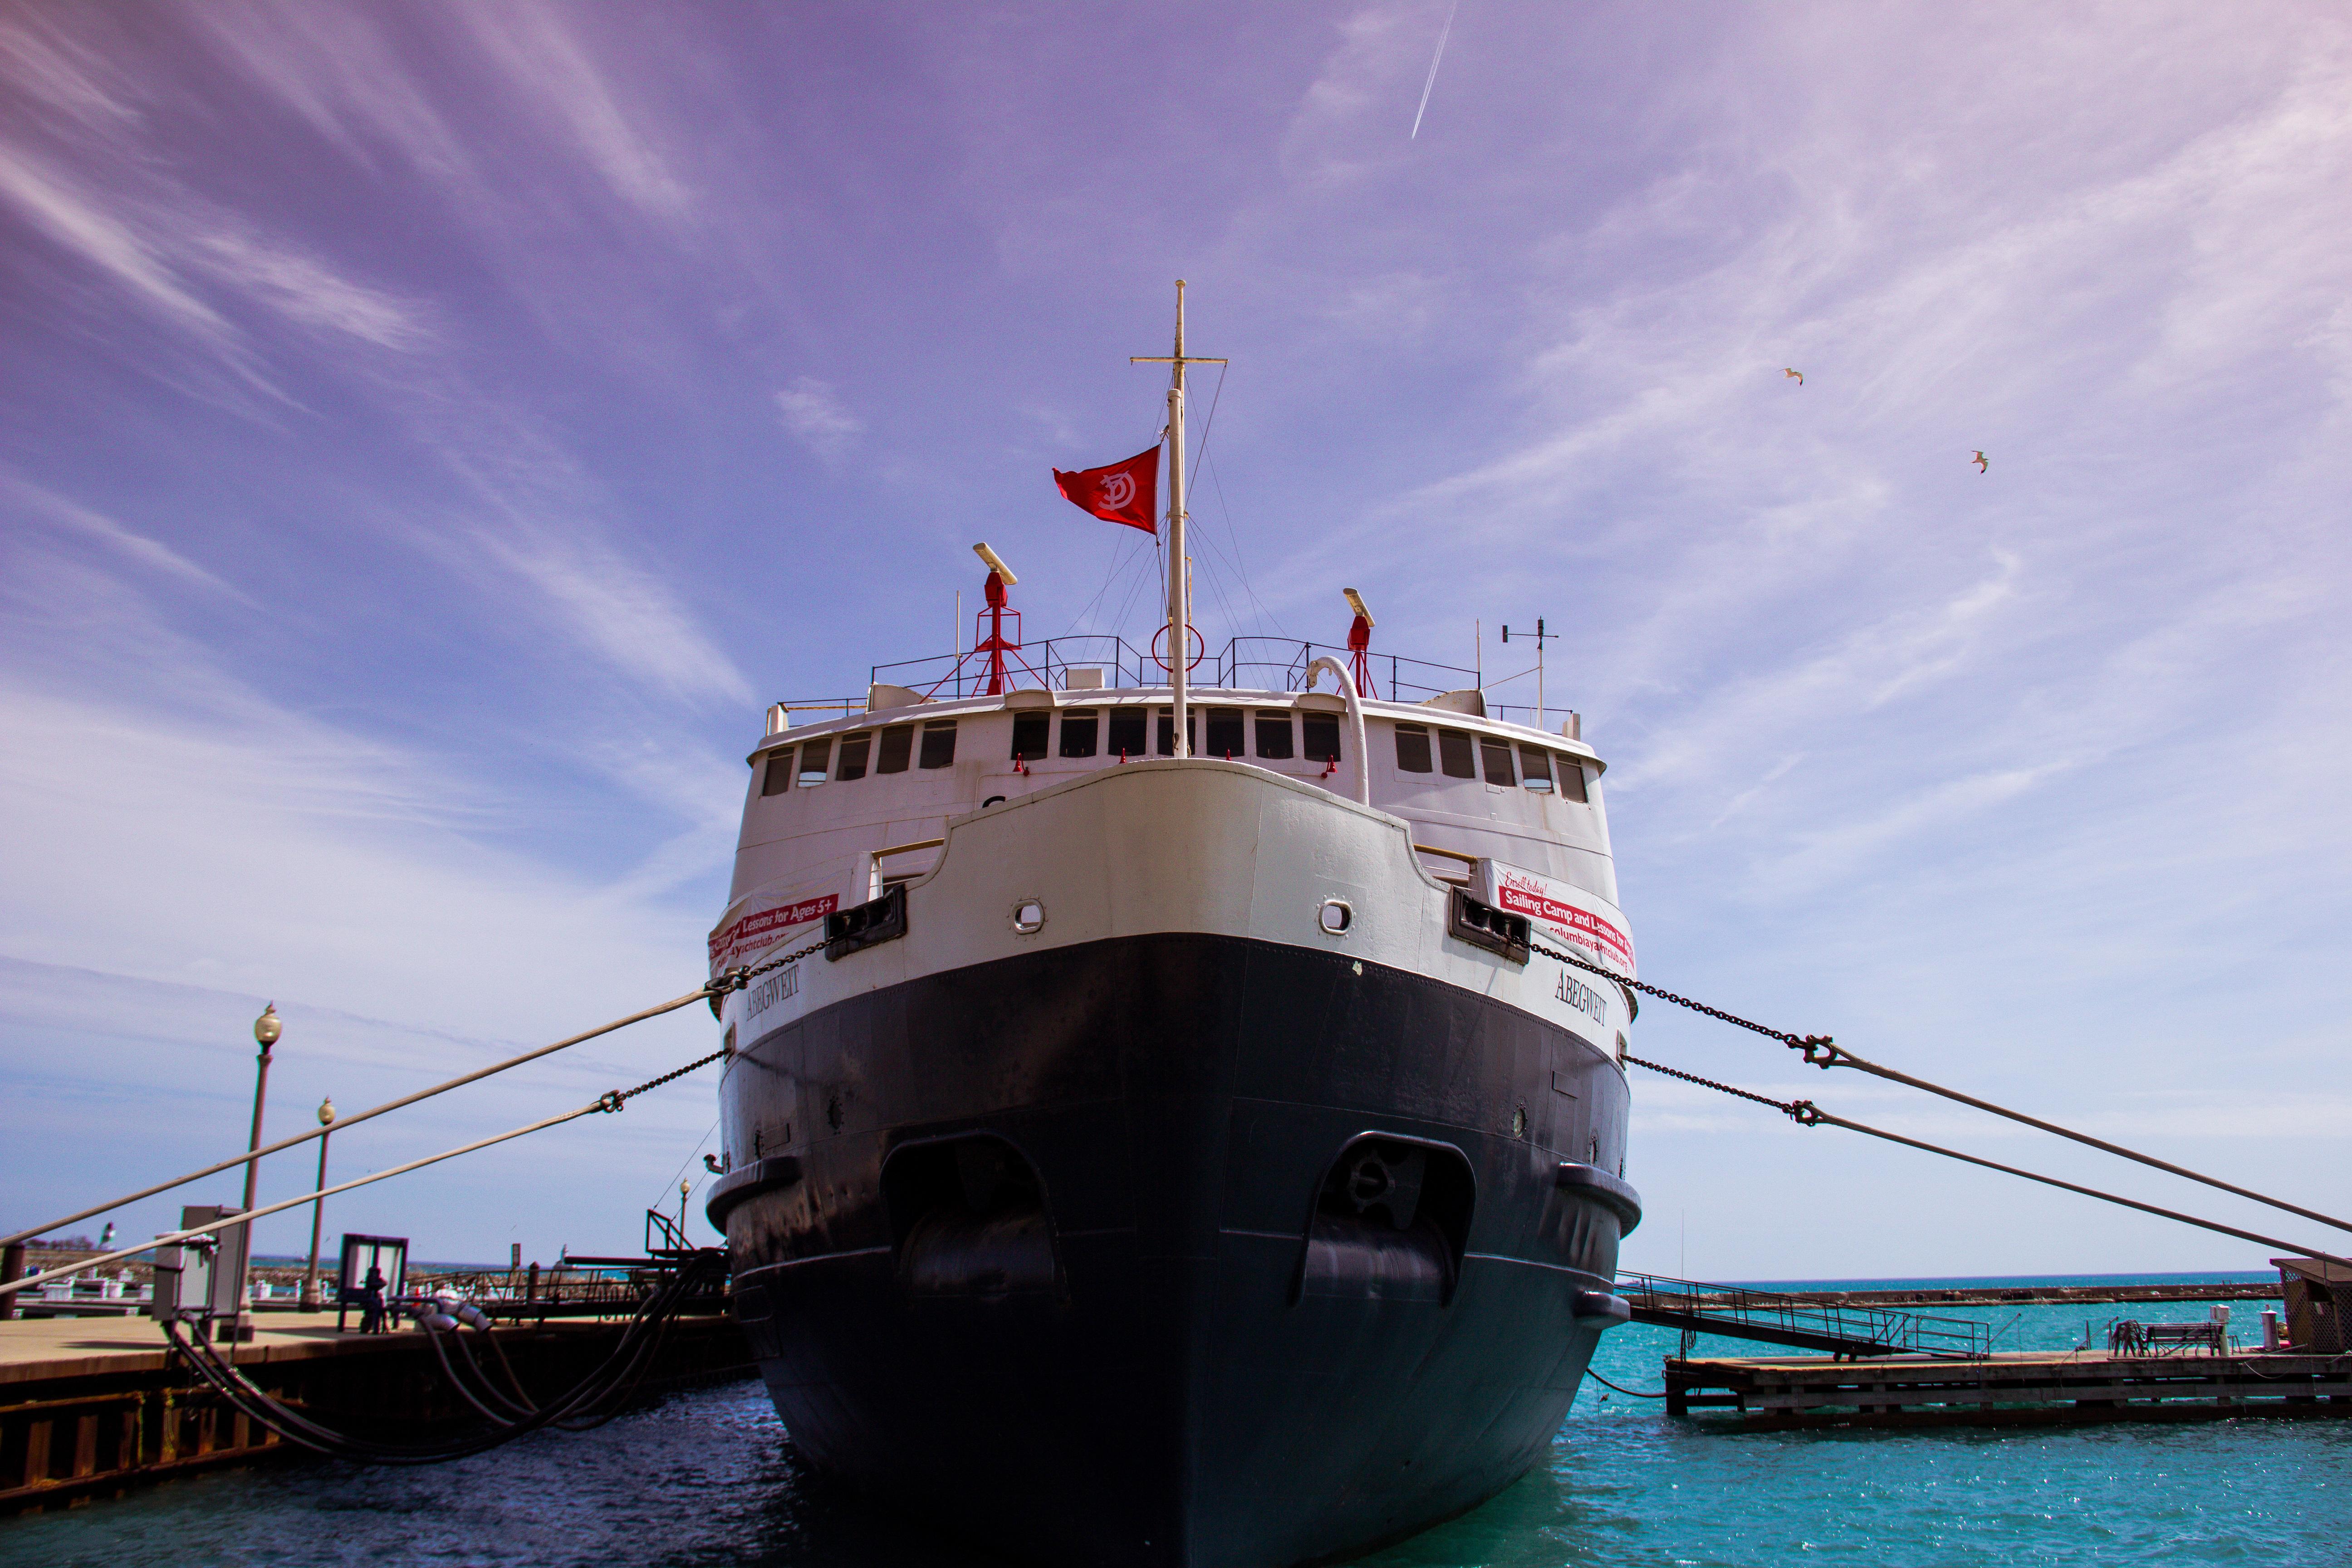 Ship, Big, Blue, Boat, Dock, HQ Photo